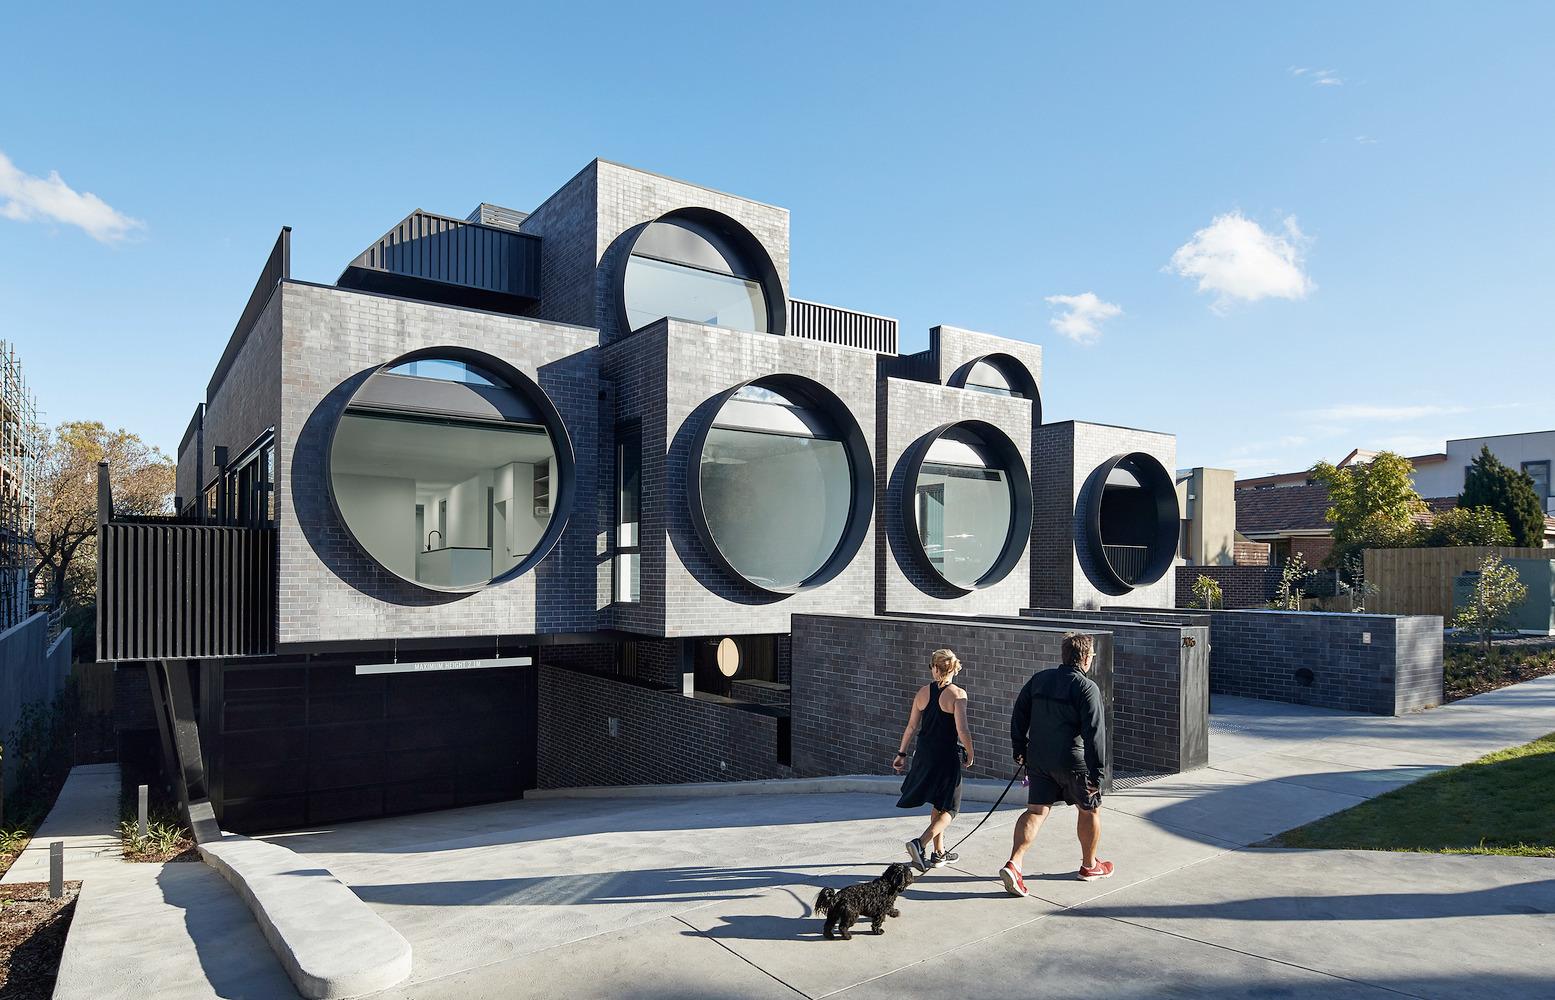 Cirqua Apartments / BKK Archite - red_wolf | ello